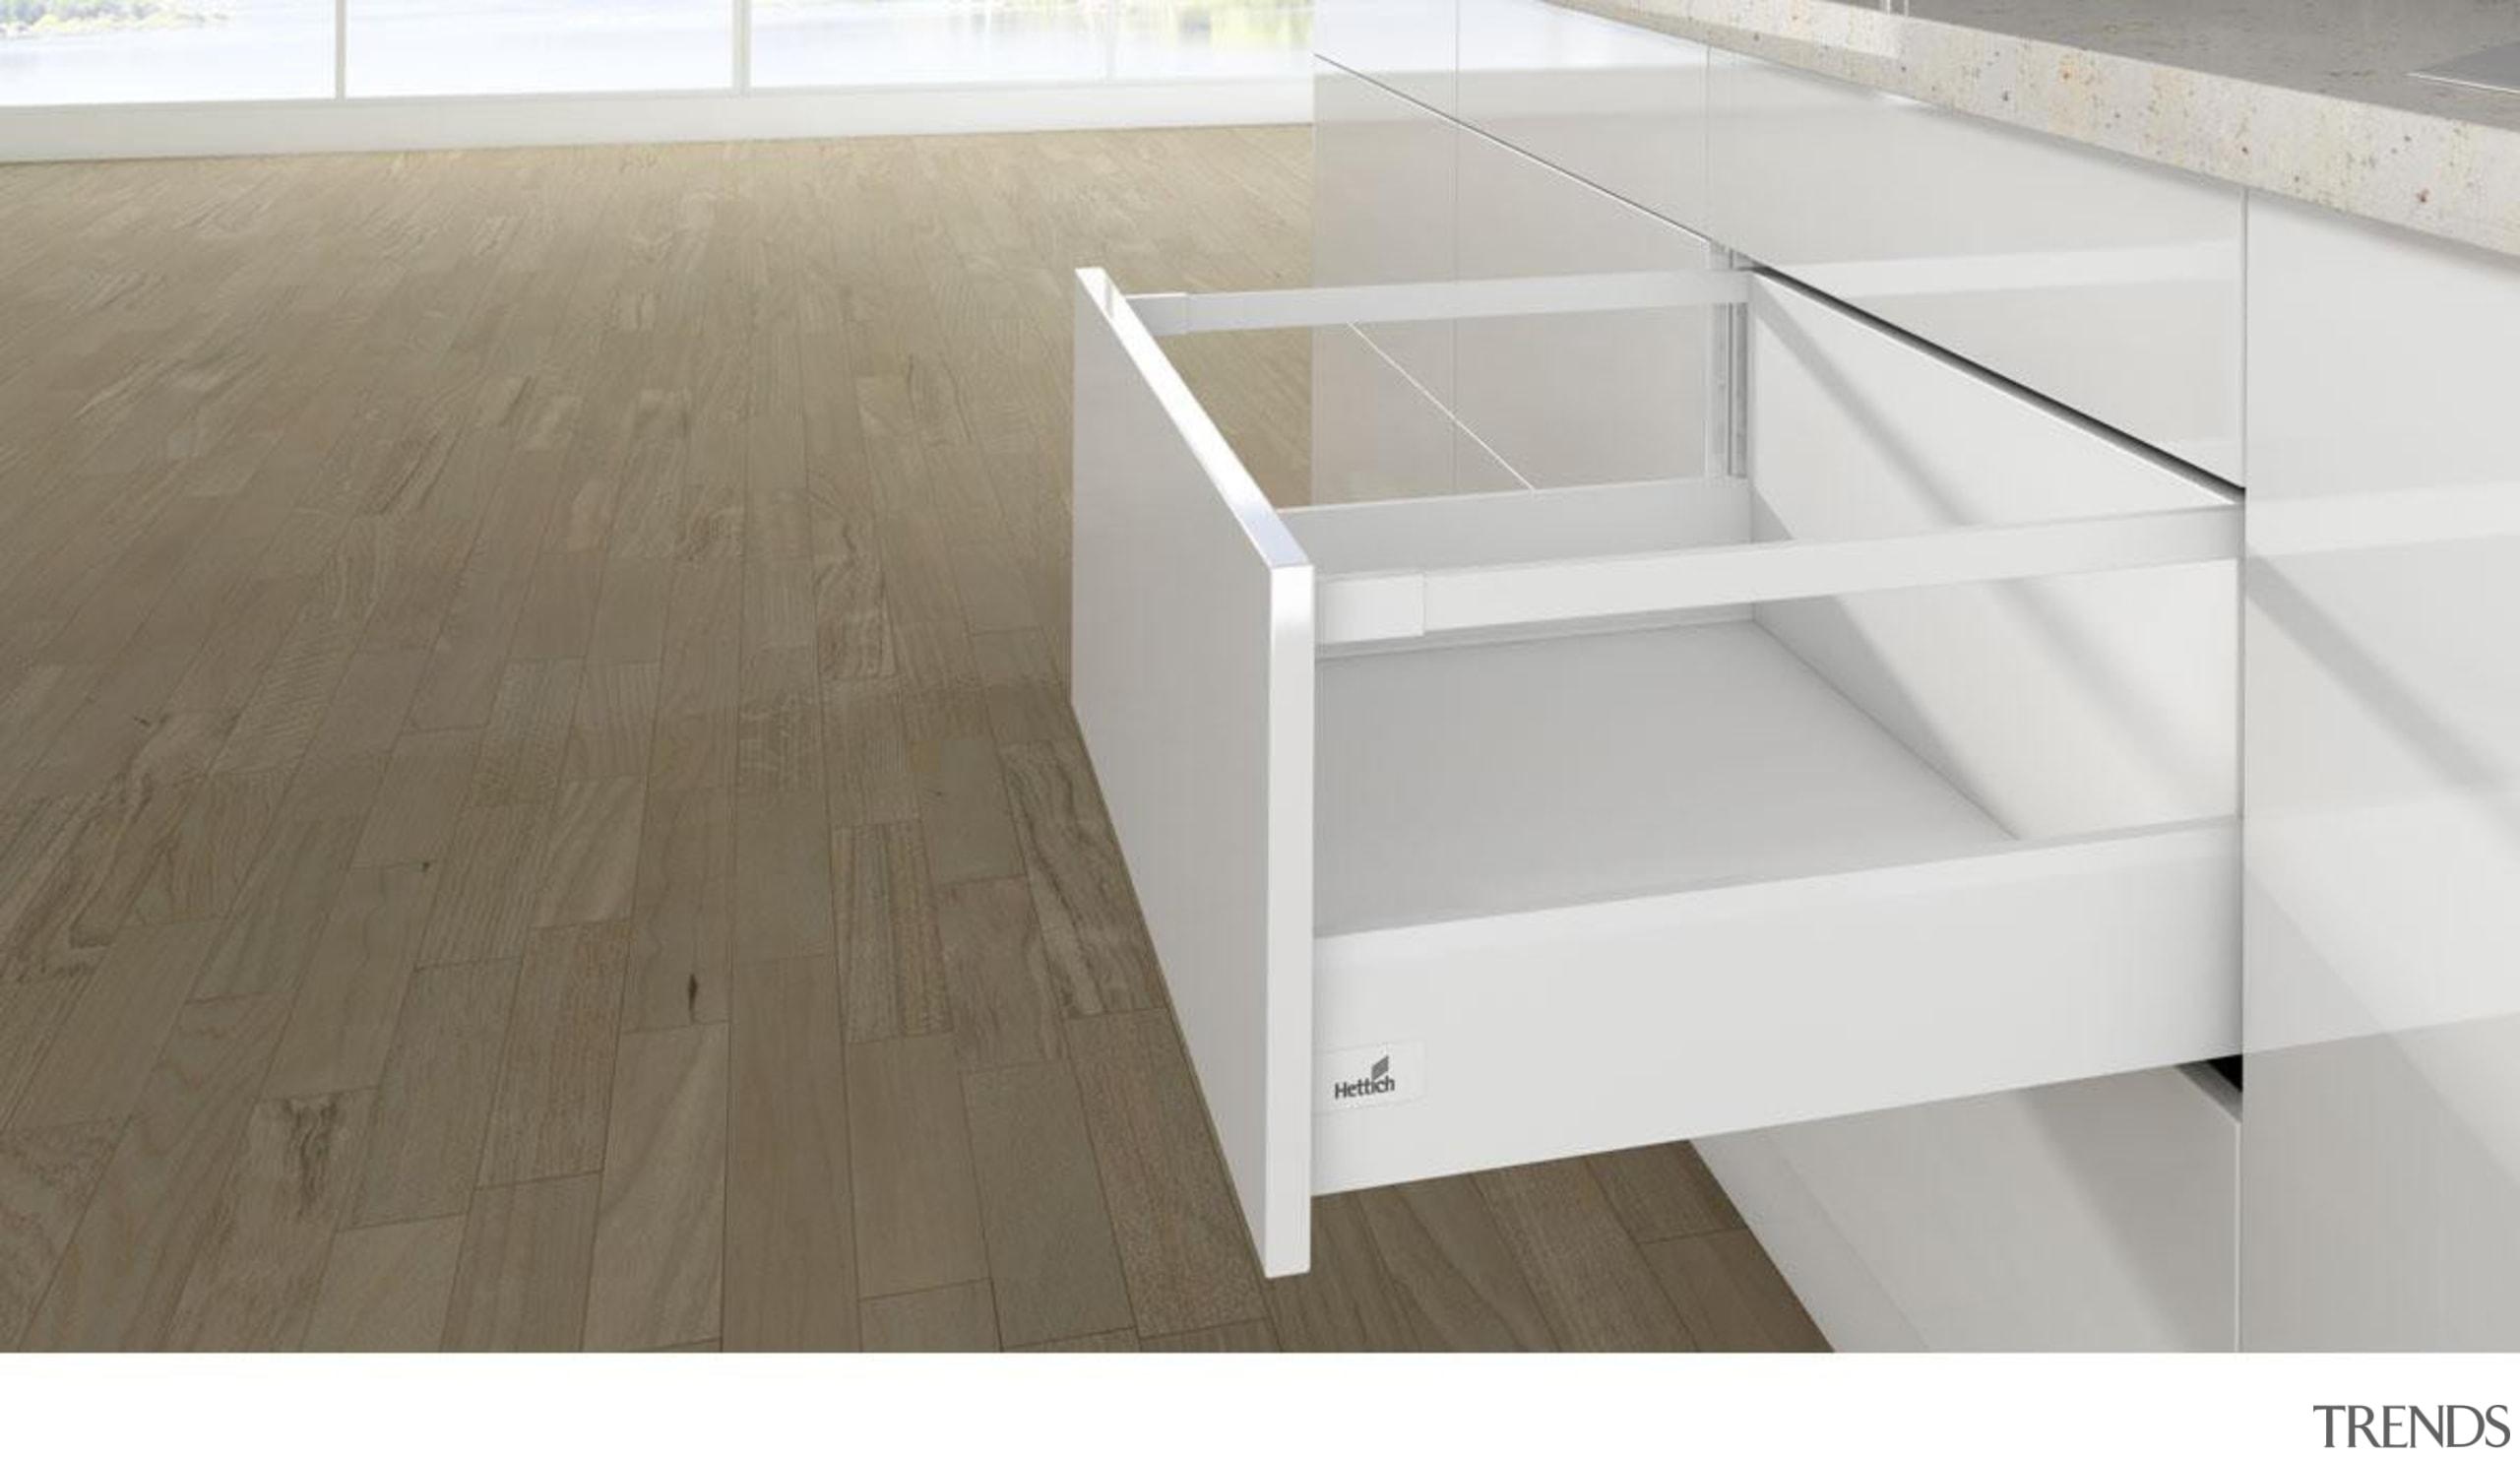 Lengthwise Railing - Rectangular - Lengthwise Railing - drawer, floor, furniture, product, product design, table, white